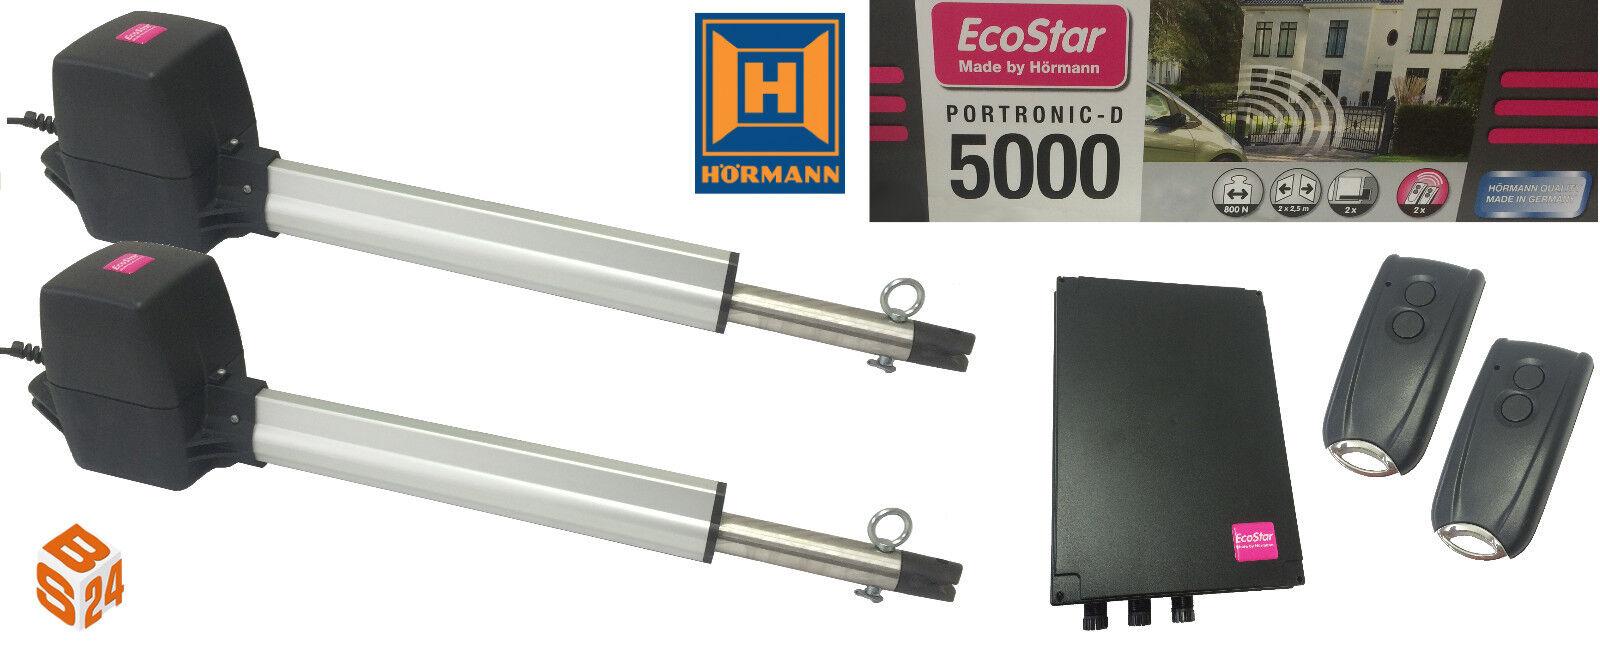 hörmann ecostar portronic d5000 drehtorantrieb 2-flügelig. -  flügeltorantrieb